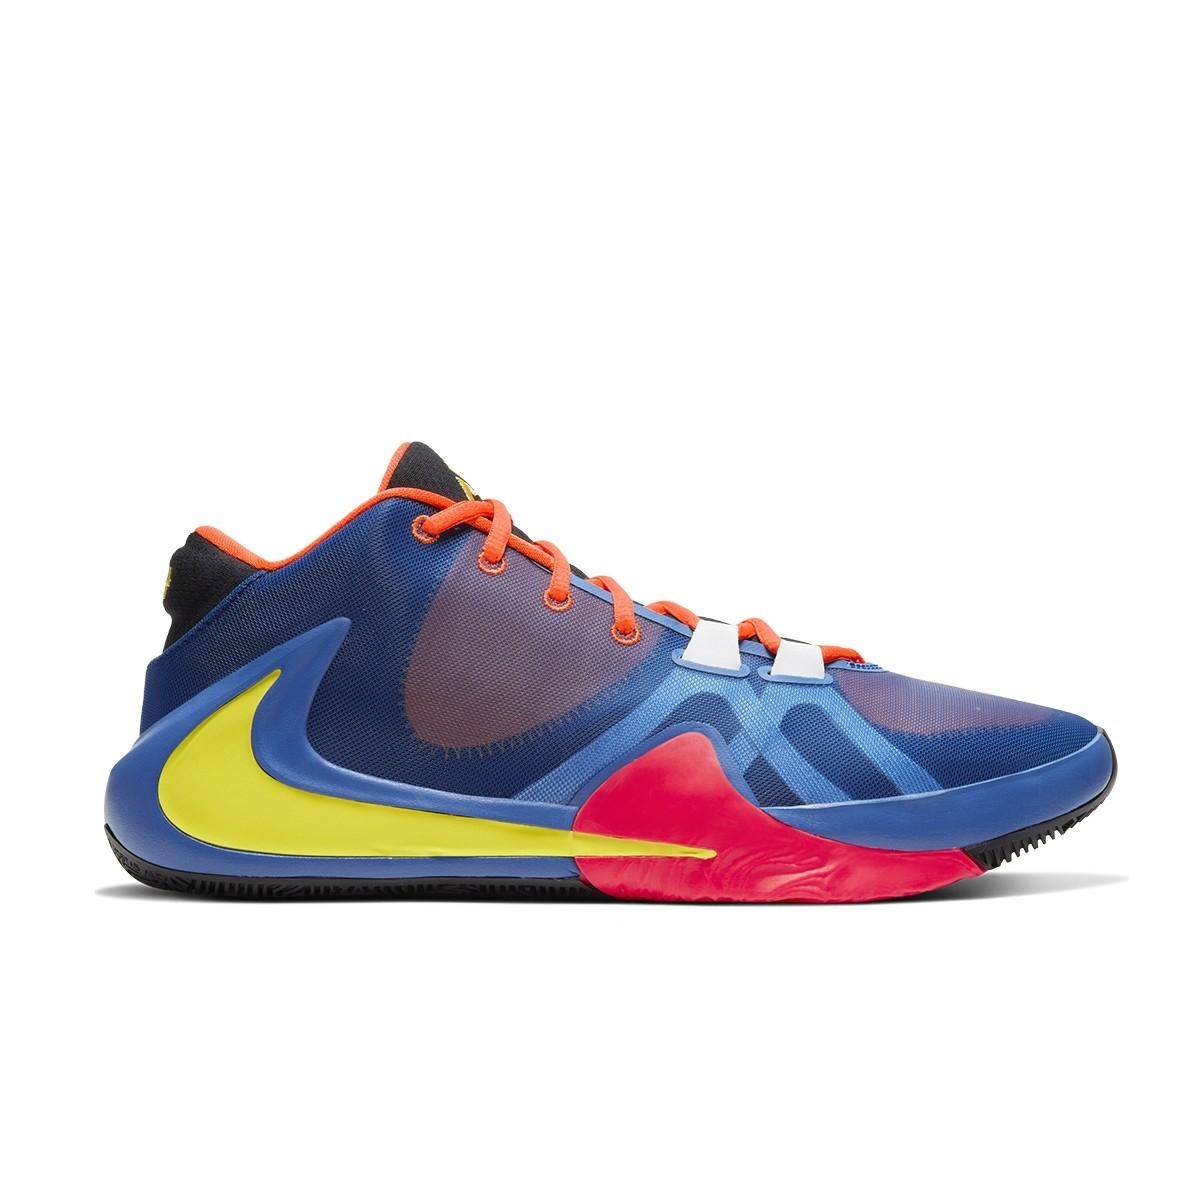 Nike Zoom Freak 1 'Multicolor'